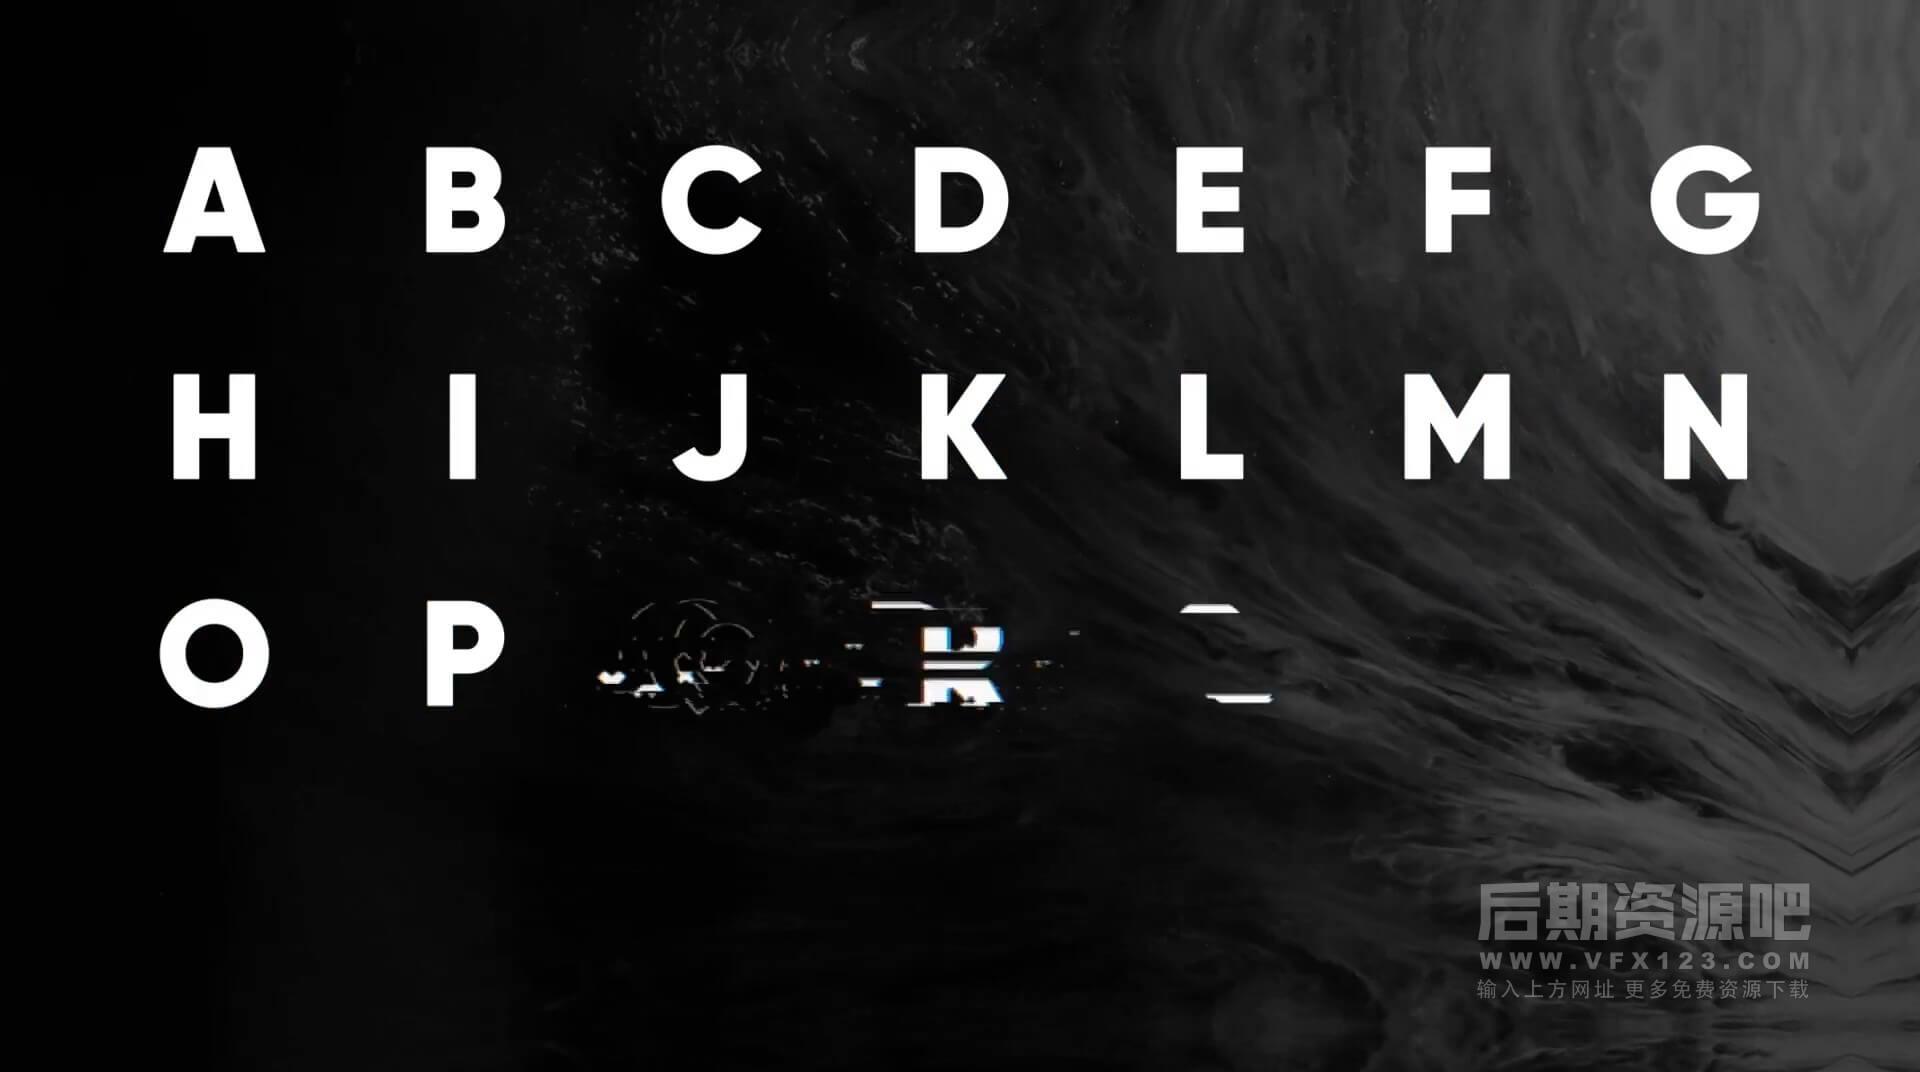 FCPX插件 数字信息化故障干扰像素损坏风格英文标题模板 Glitch Animated Typeface